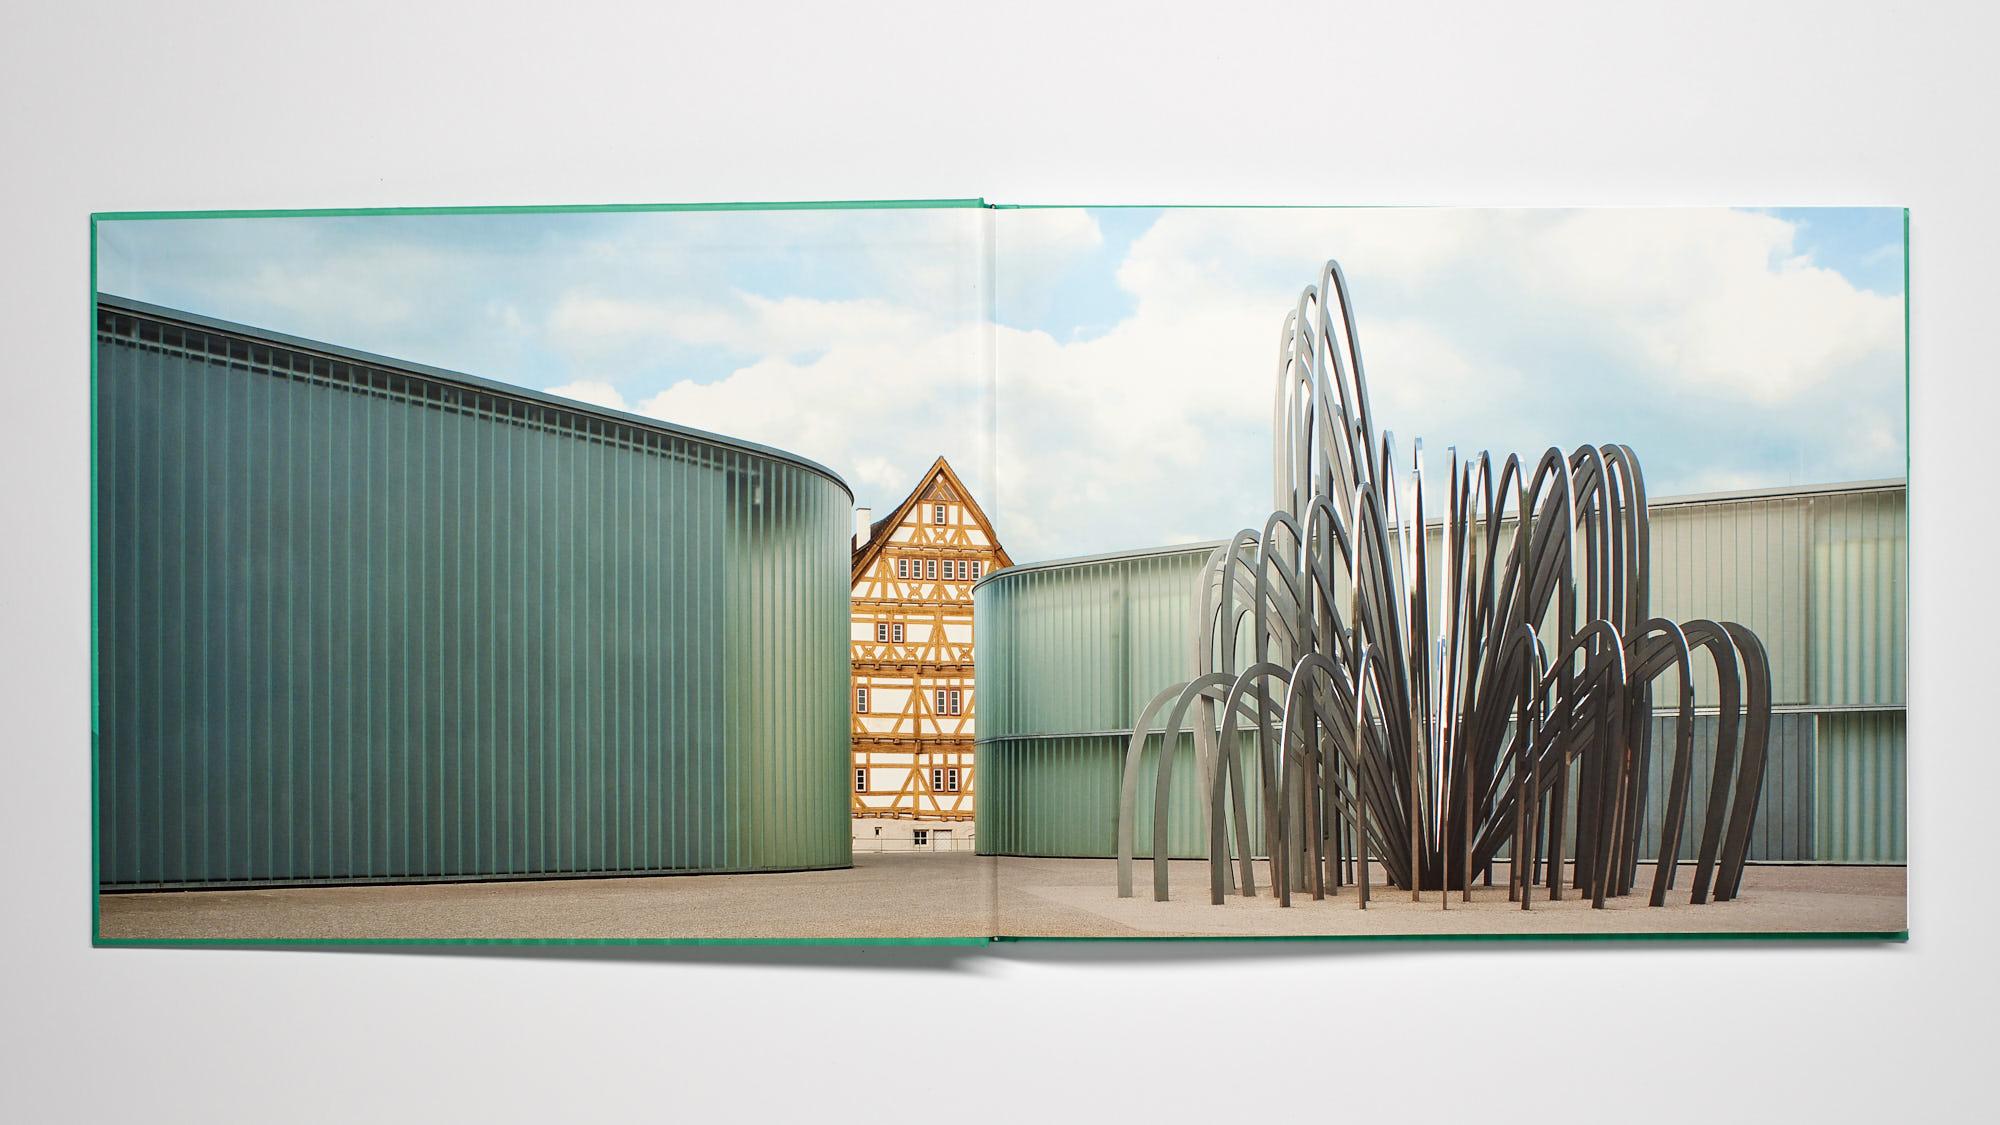 Stihl Galerie WN Ensemble - 10 Jahre Galerie Stihl Waiblingen